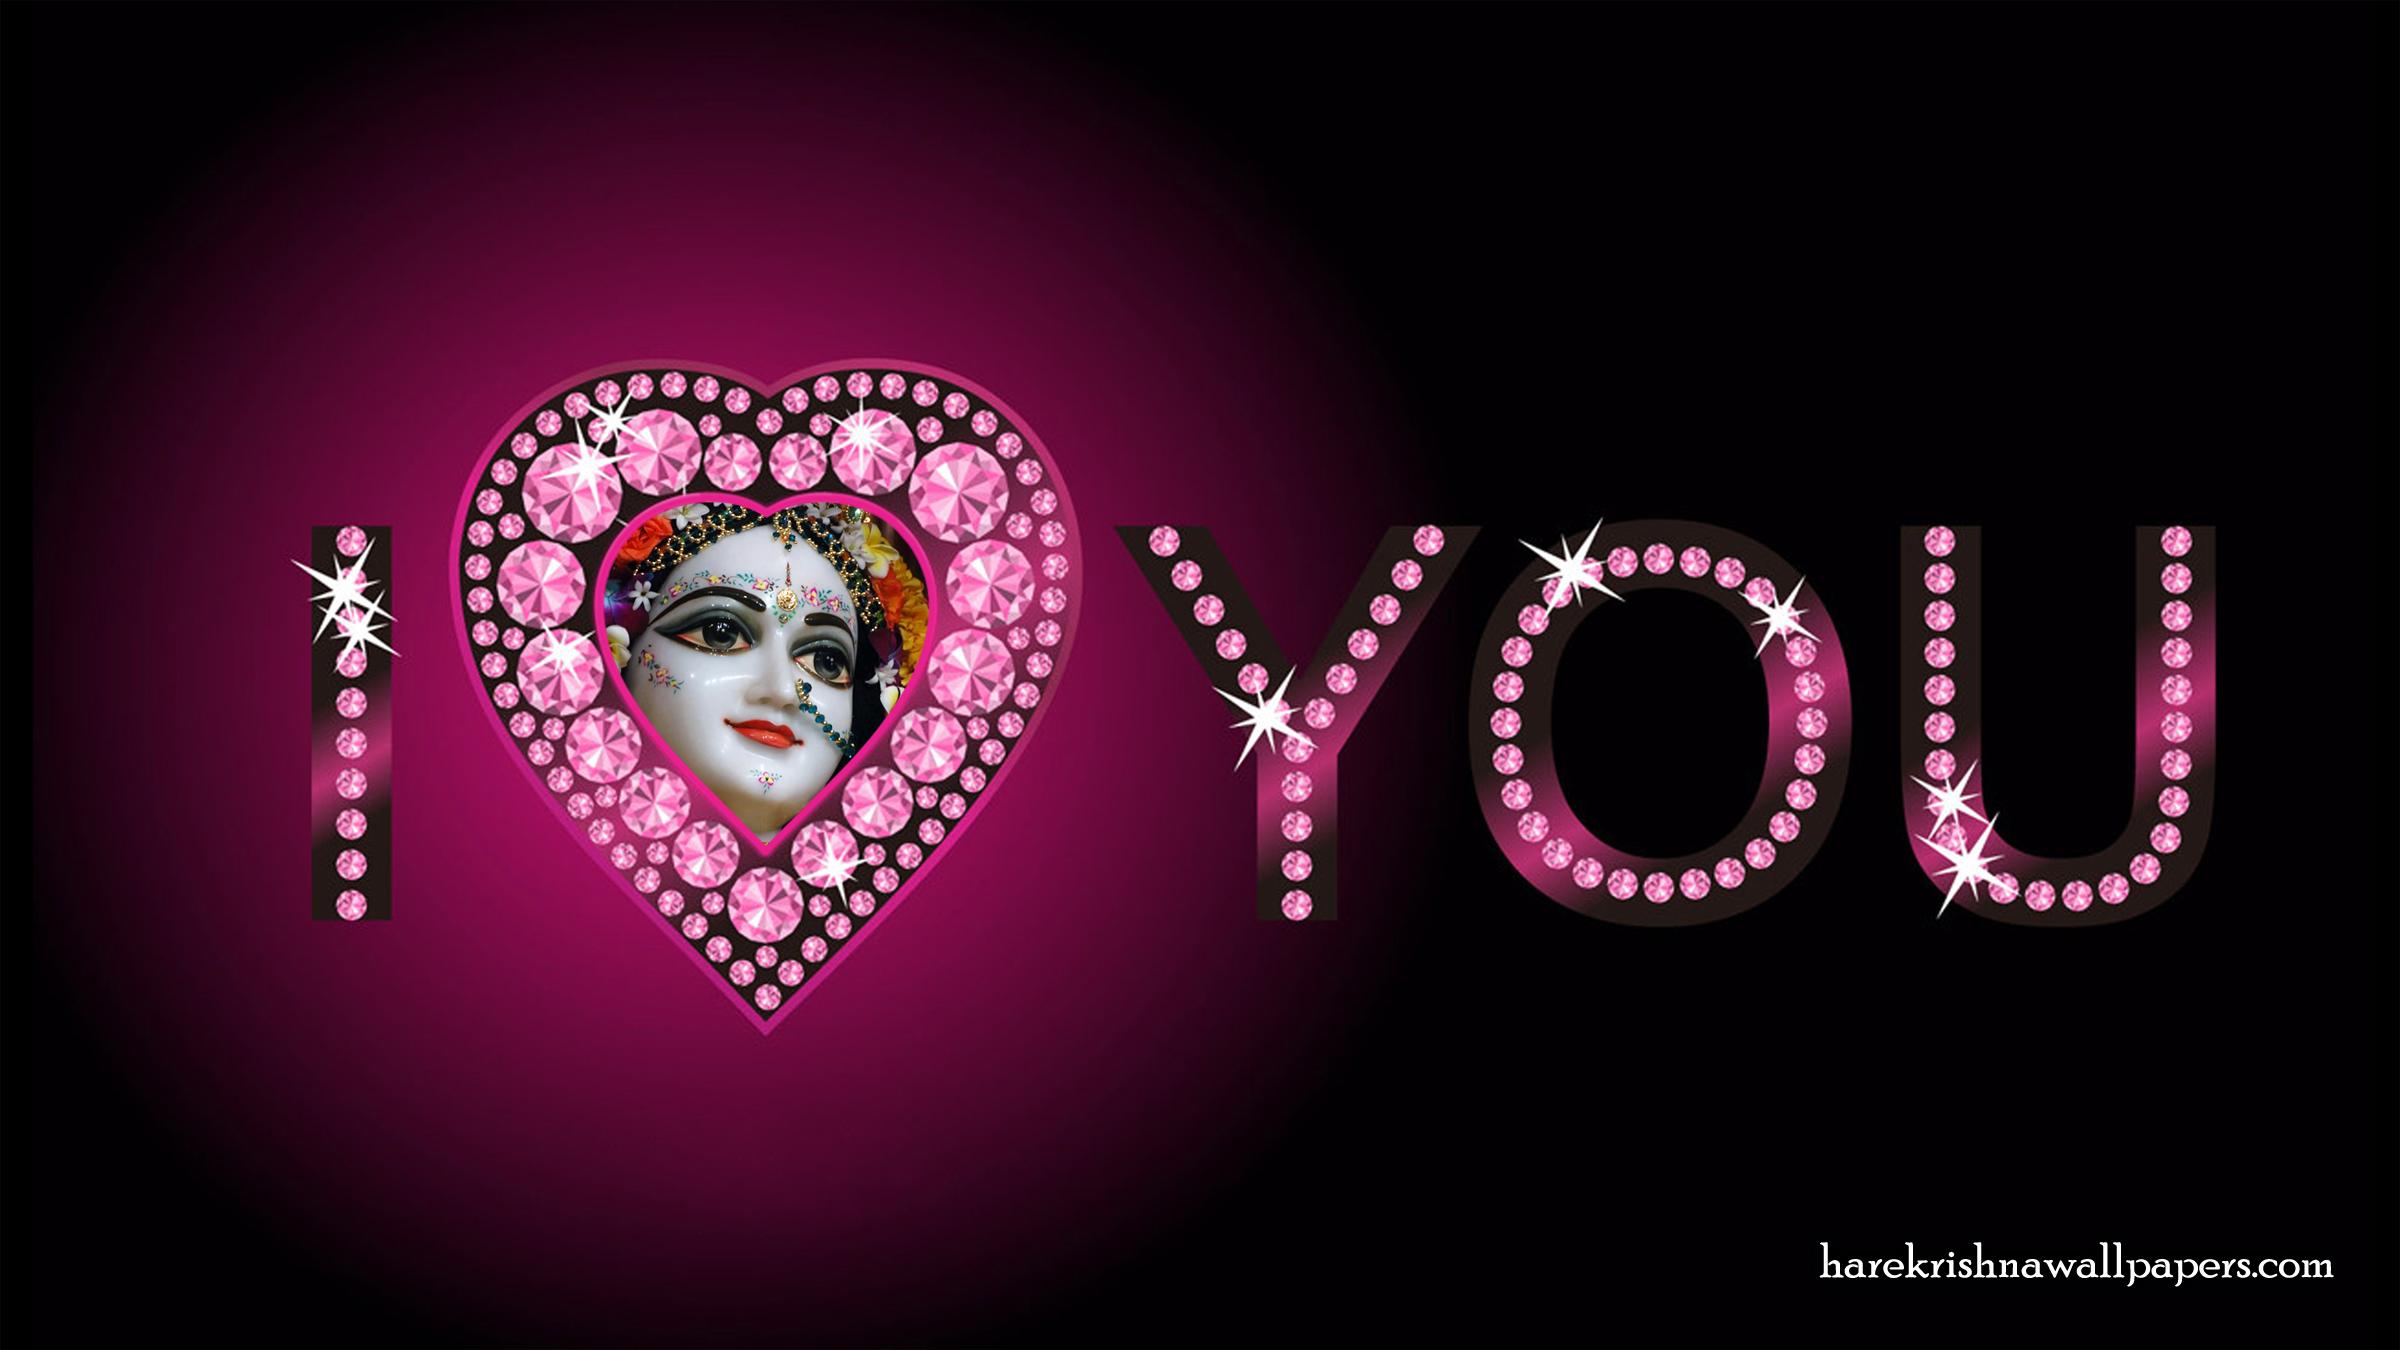 I Love You Radharani Wallpaper (013) Size 2400x1350 Download